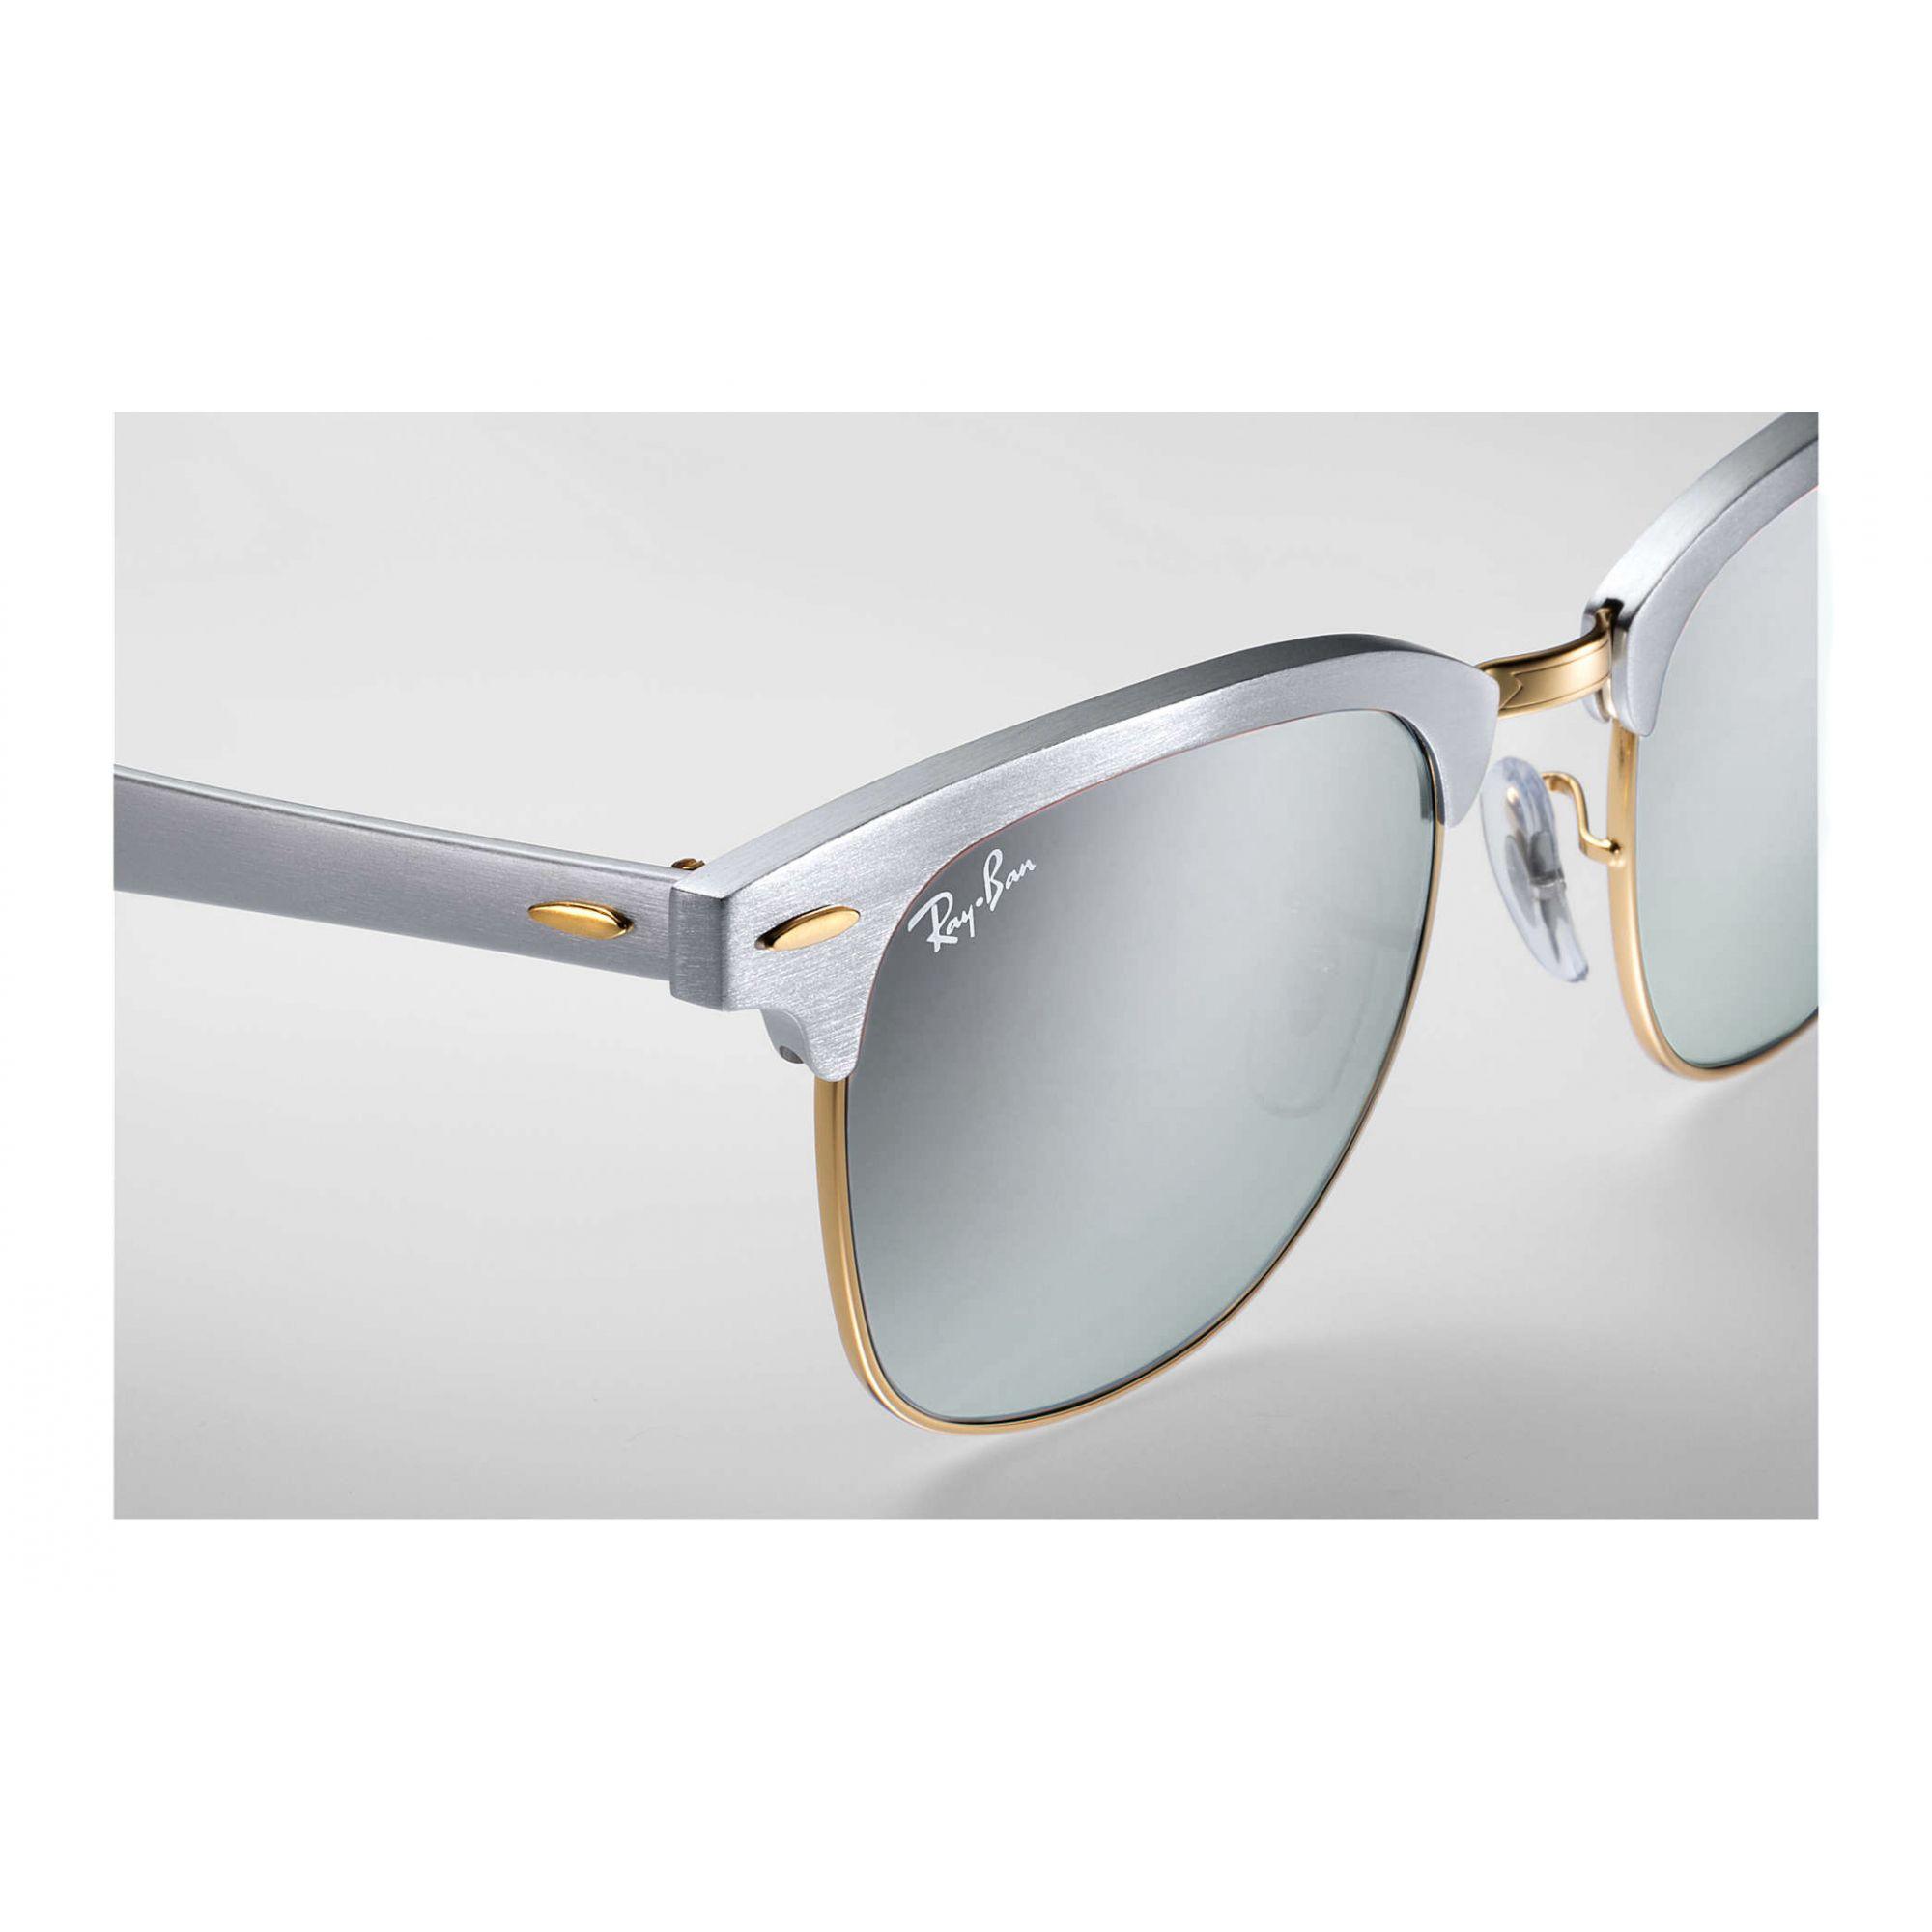 Óculos de Sol Unissex Ray-Ban ClubMaster Aluminum